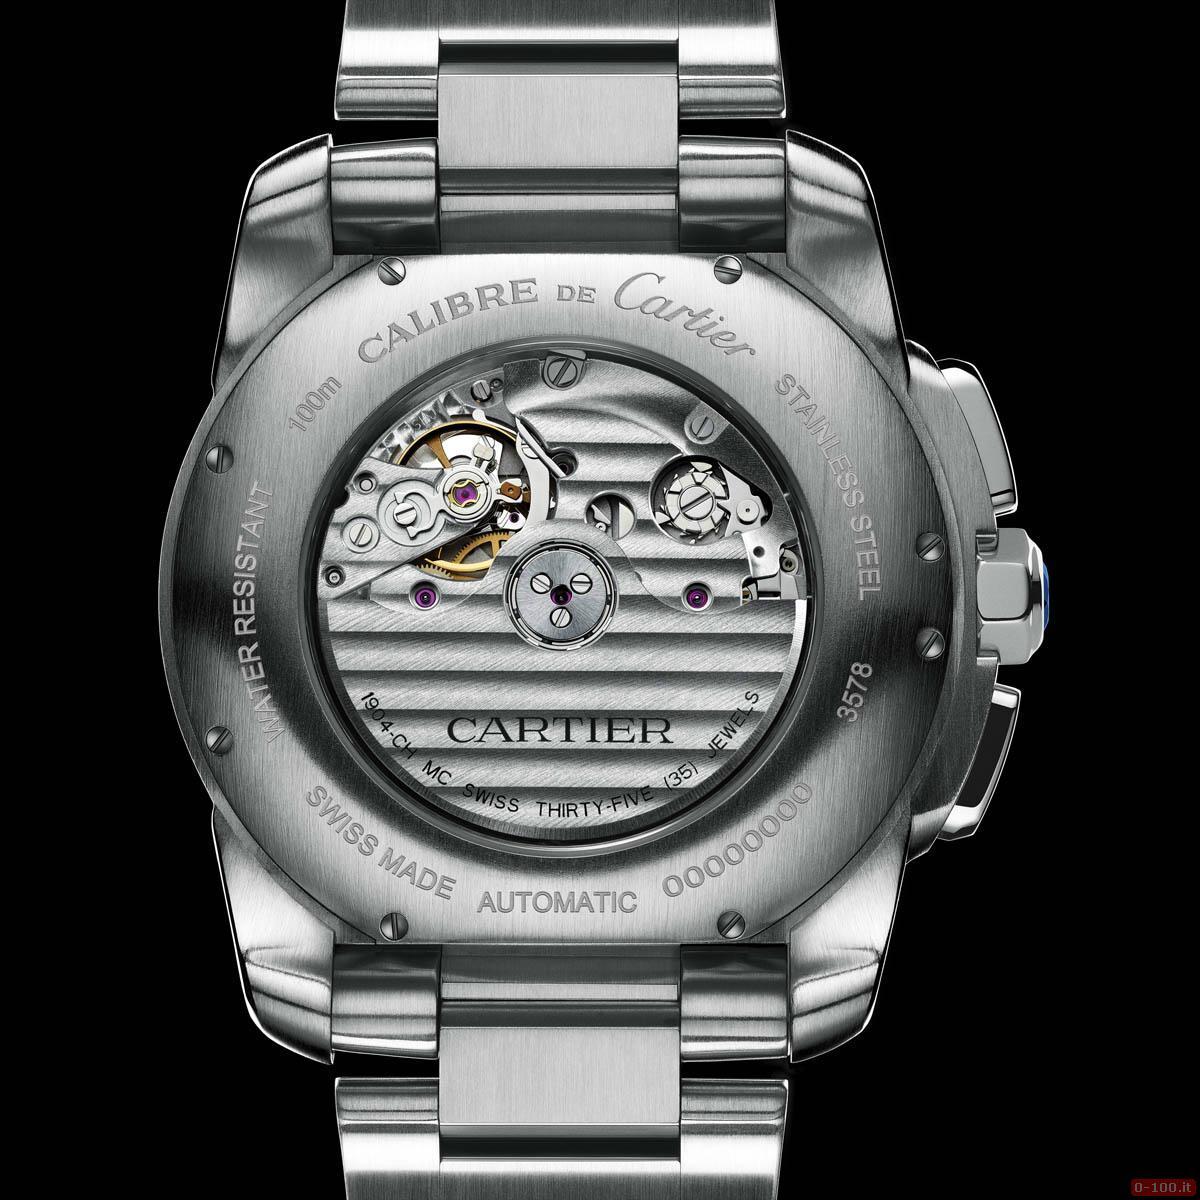 Cartier Calibre Chronograph Watch _0-1007